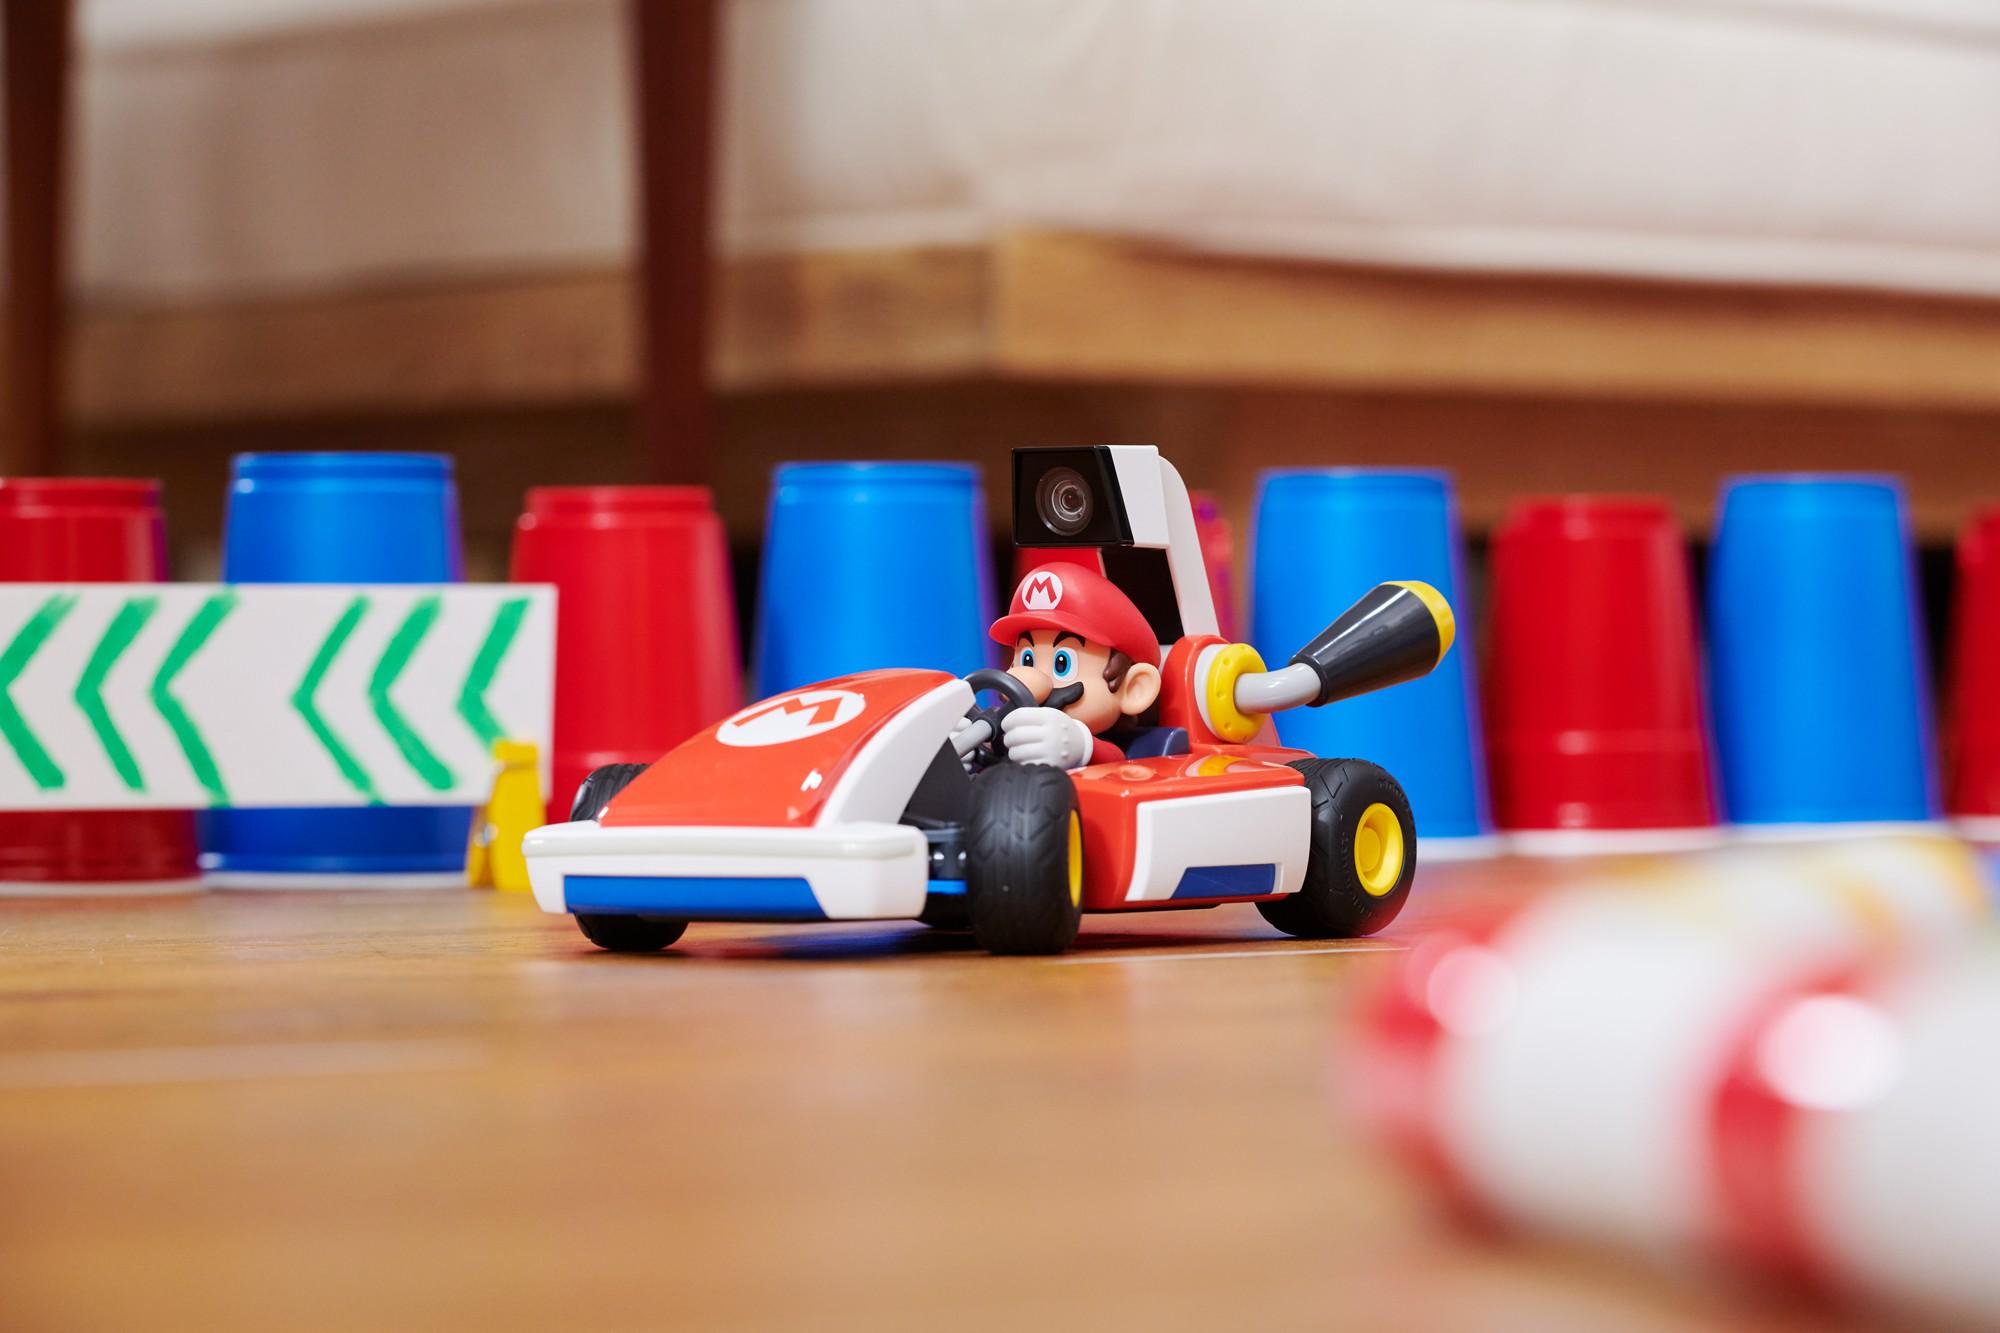 Mario Kart Live Home Circuit Mario car play set